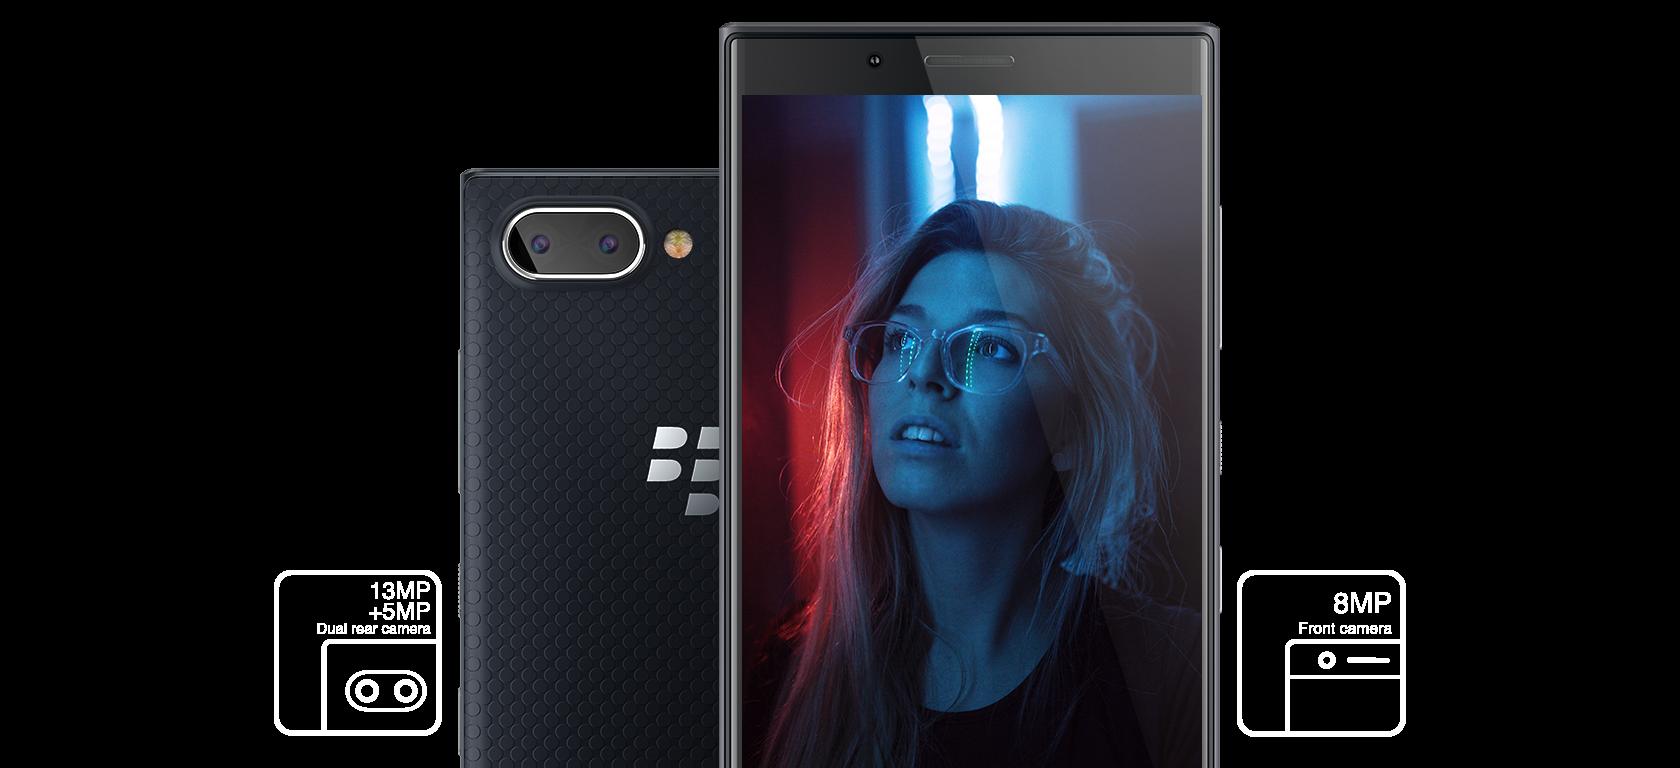 dual camera1 - BlackBerry KEY2 LE